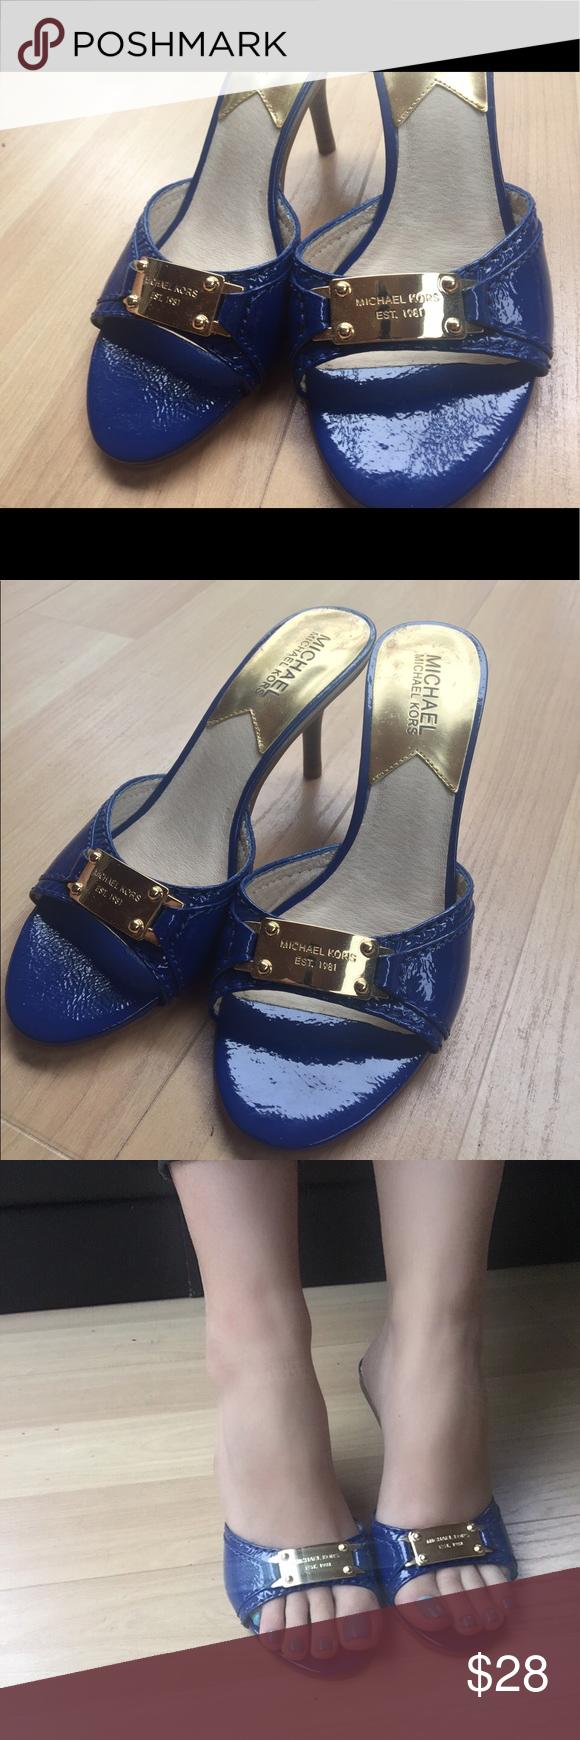 Michael Kors blue & gold sandal Gorgeous blue MK sandal, size 6.5 with a 1.5 inch heel Michael Kors Shoes Heels